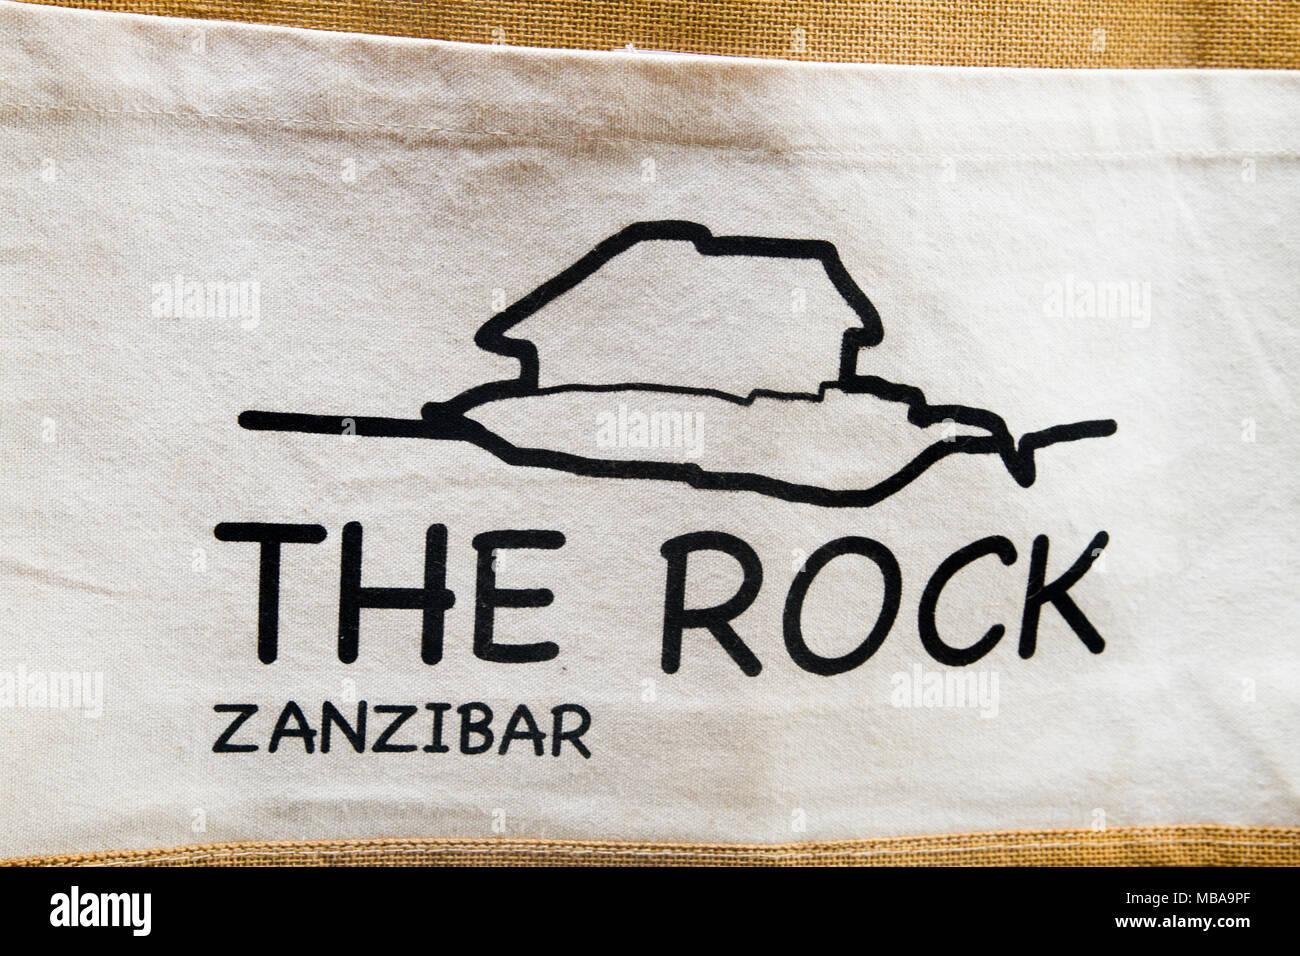 ZANZIBAR, TANZANIA - JANUARY 05: Sign of The Rock restaurant in Zanzibar, Tanzania on January 6th, 2018 - Stock Image